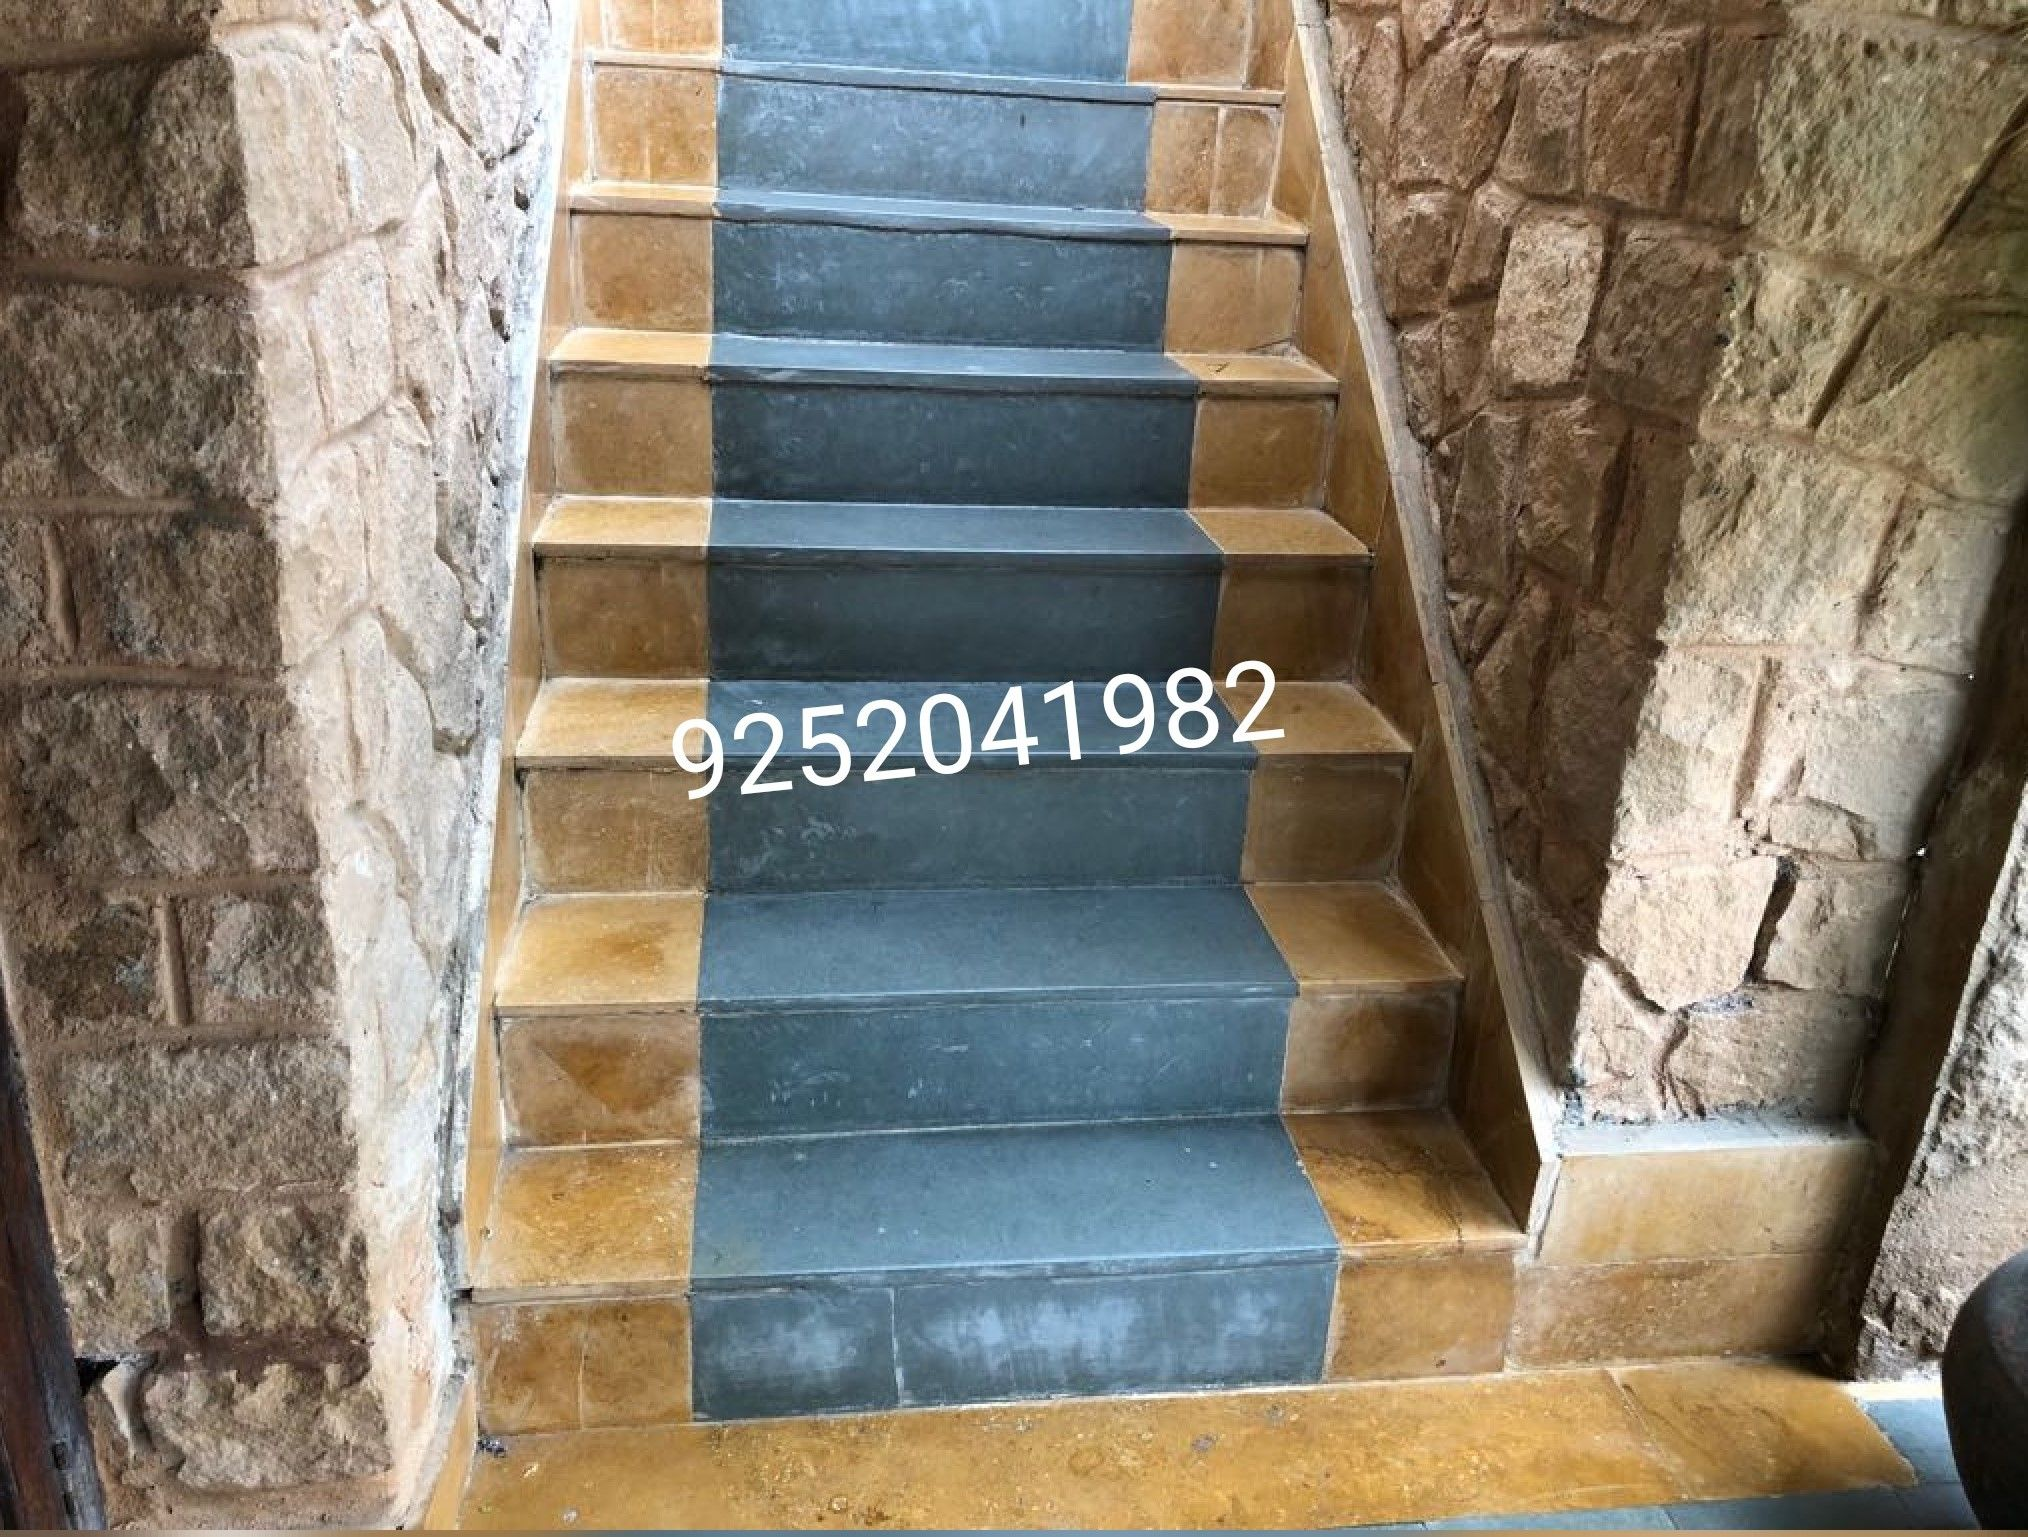 jaisalmer stone uses